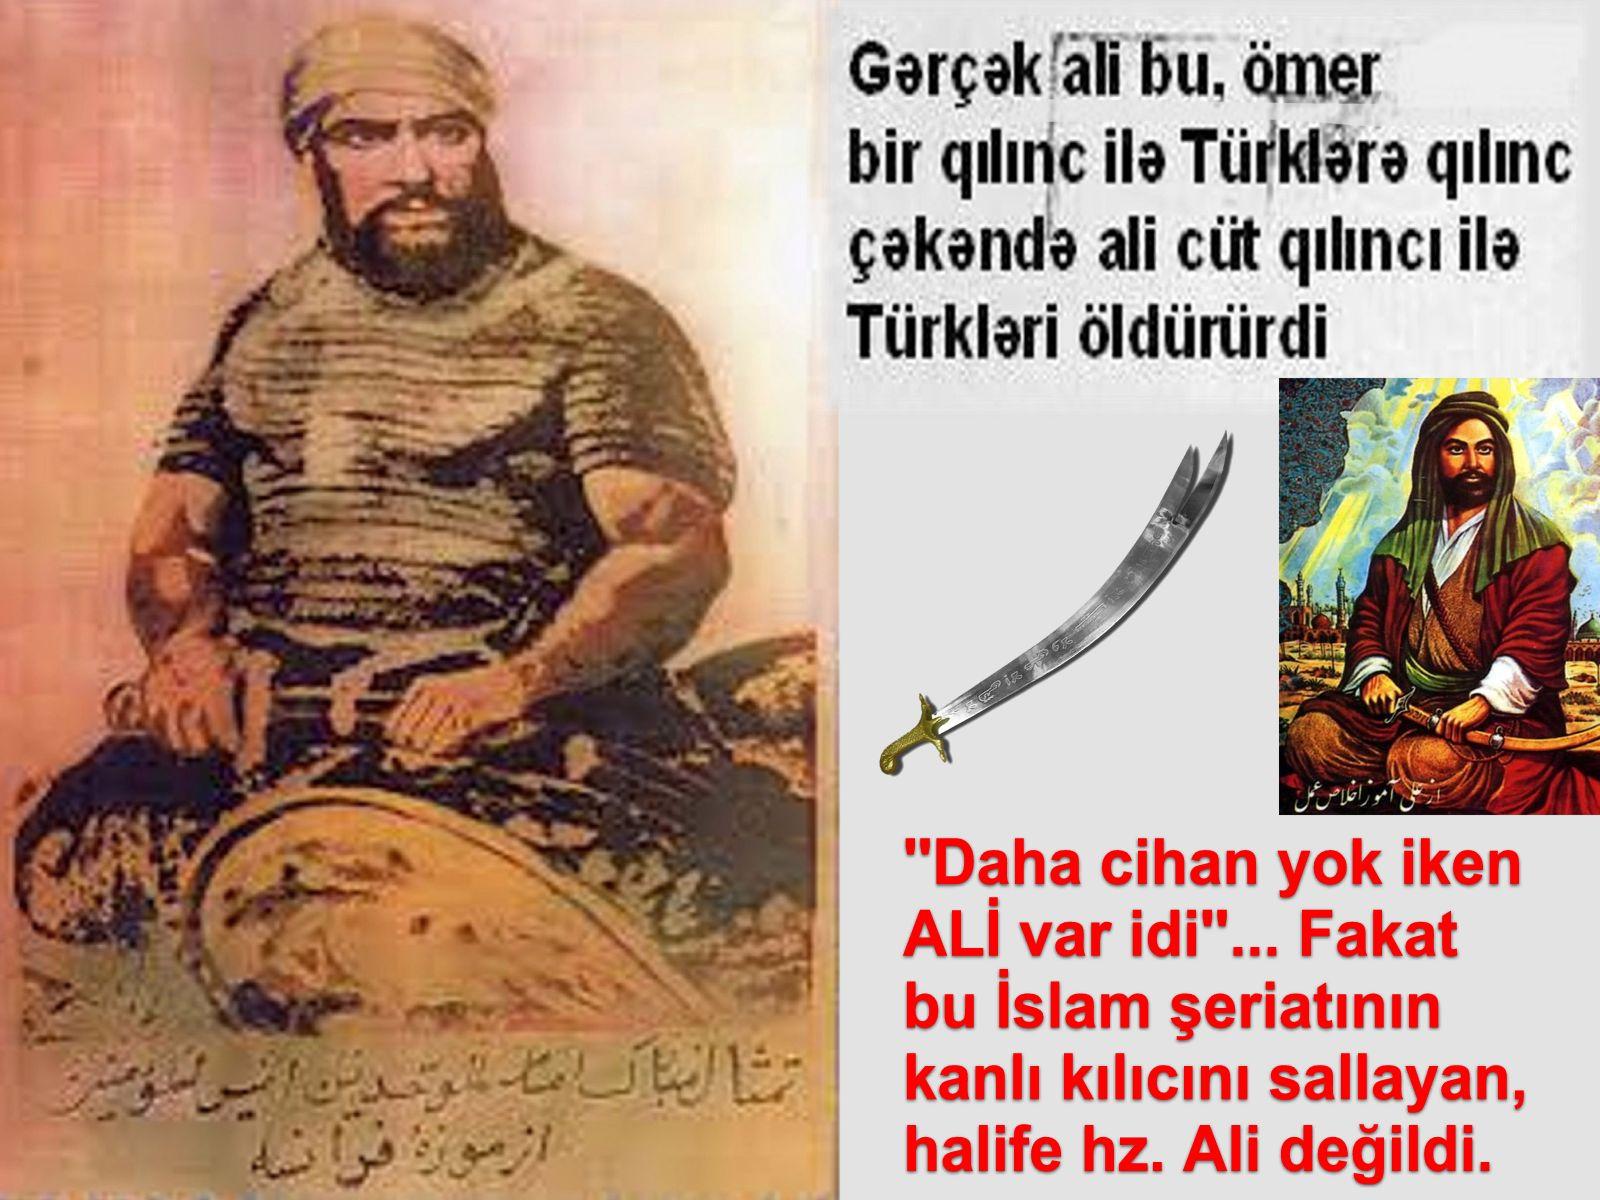 1 Hz imam Ali divani Alevi bektasi kizilbas pir sultan devrimci aleviler birligi DAB Feramuz Sah Acar ali cihan var iken